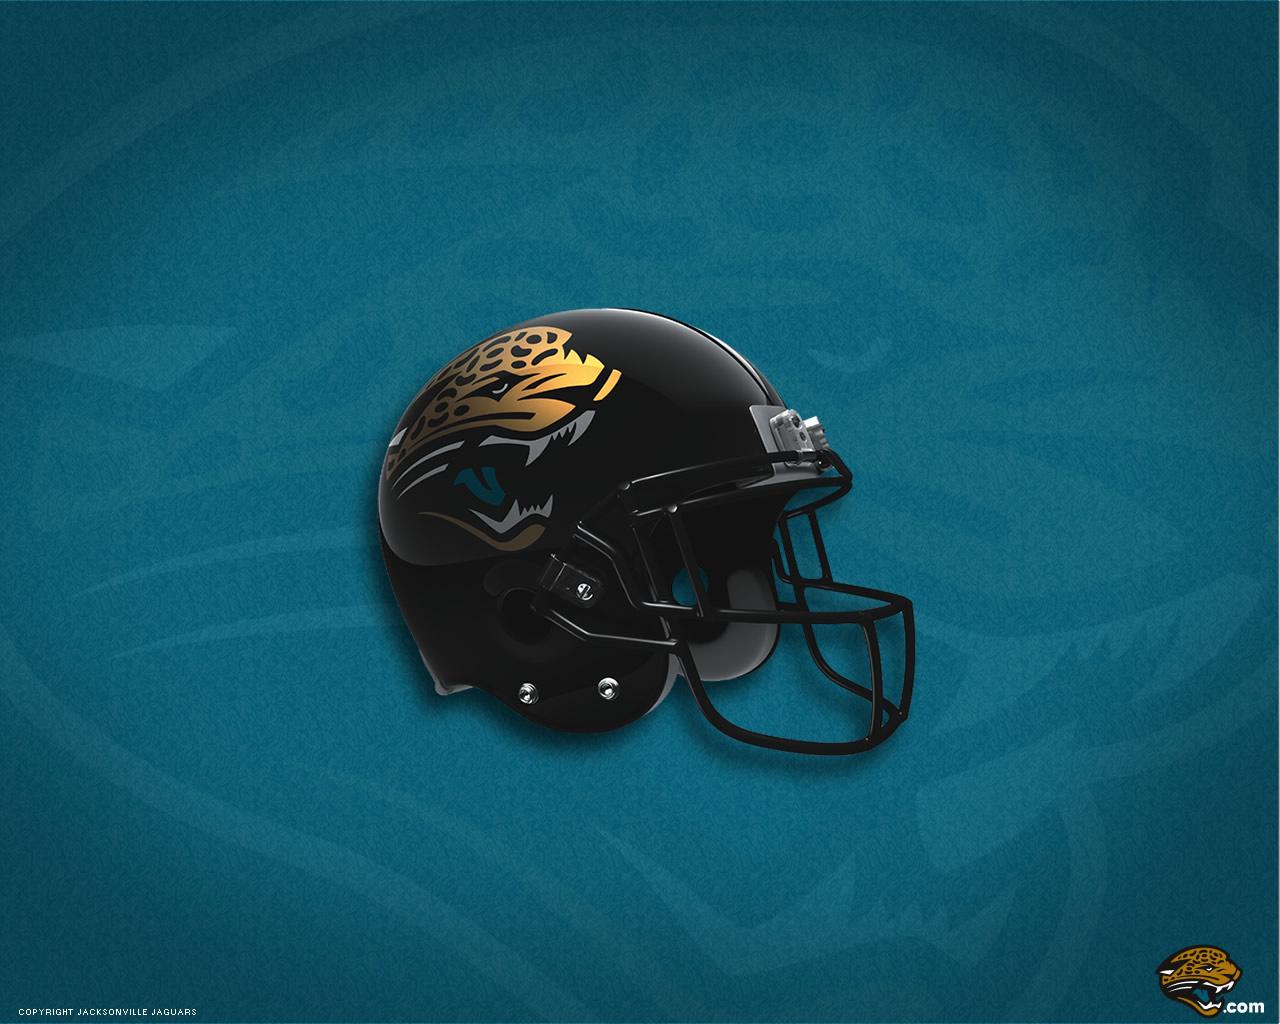 jaguars jacksonville jaguars jacksonville jaguars logo 1280x1024